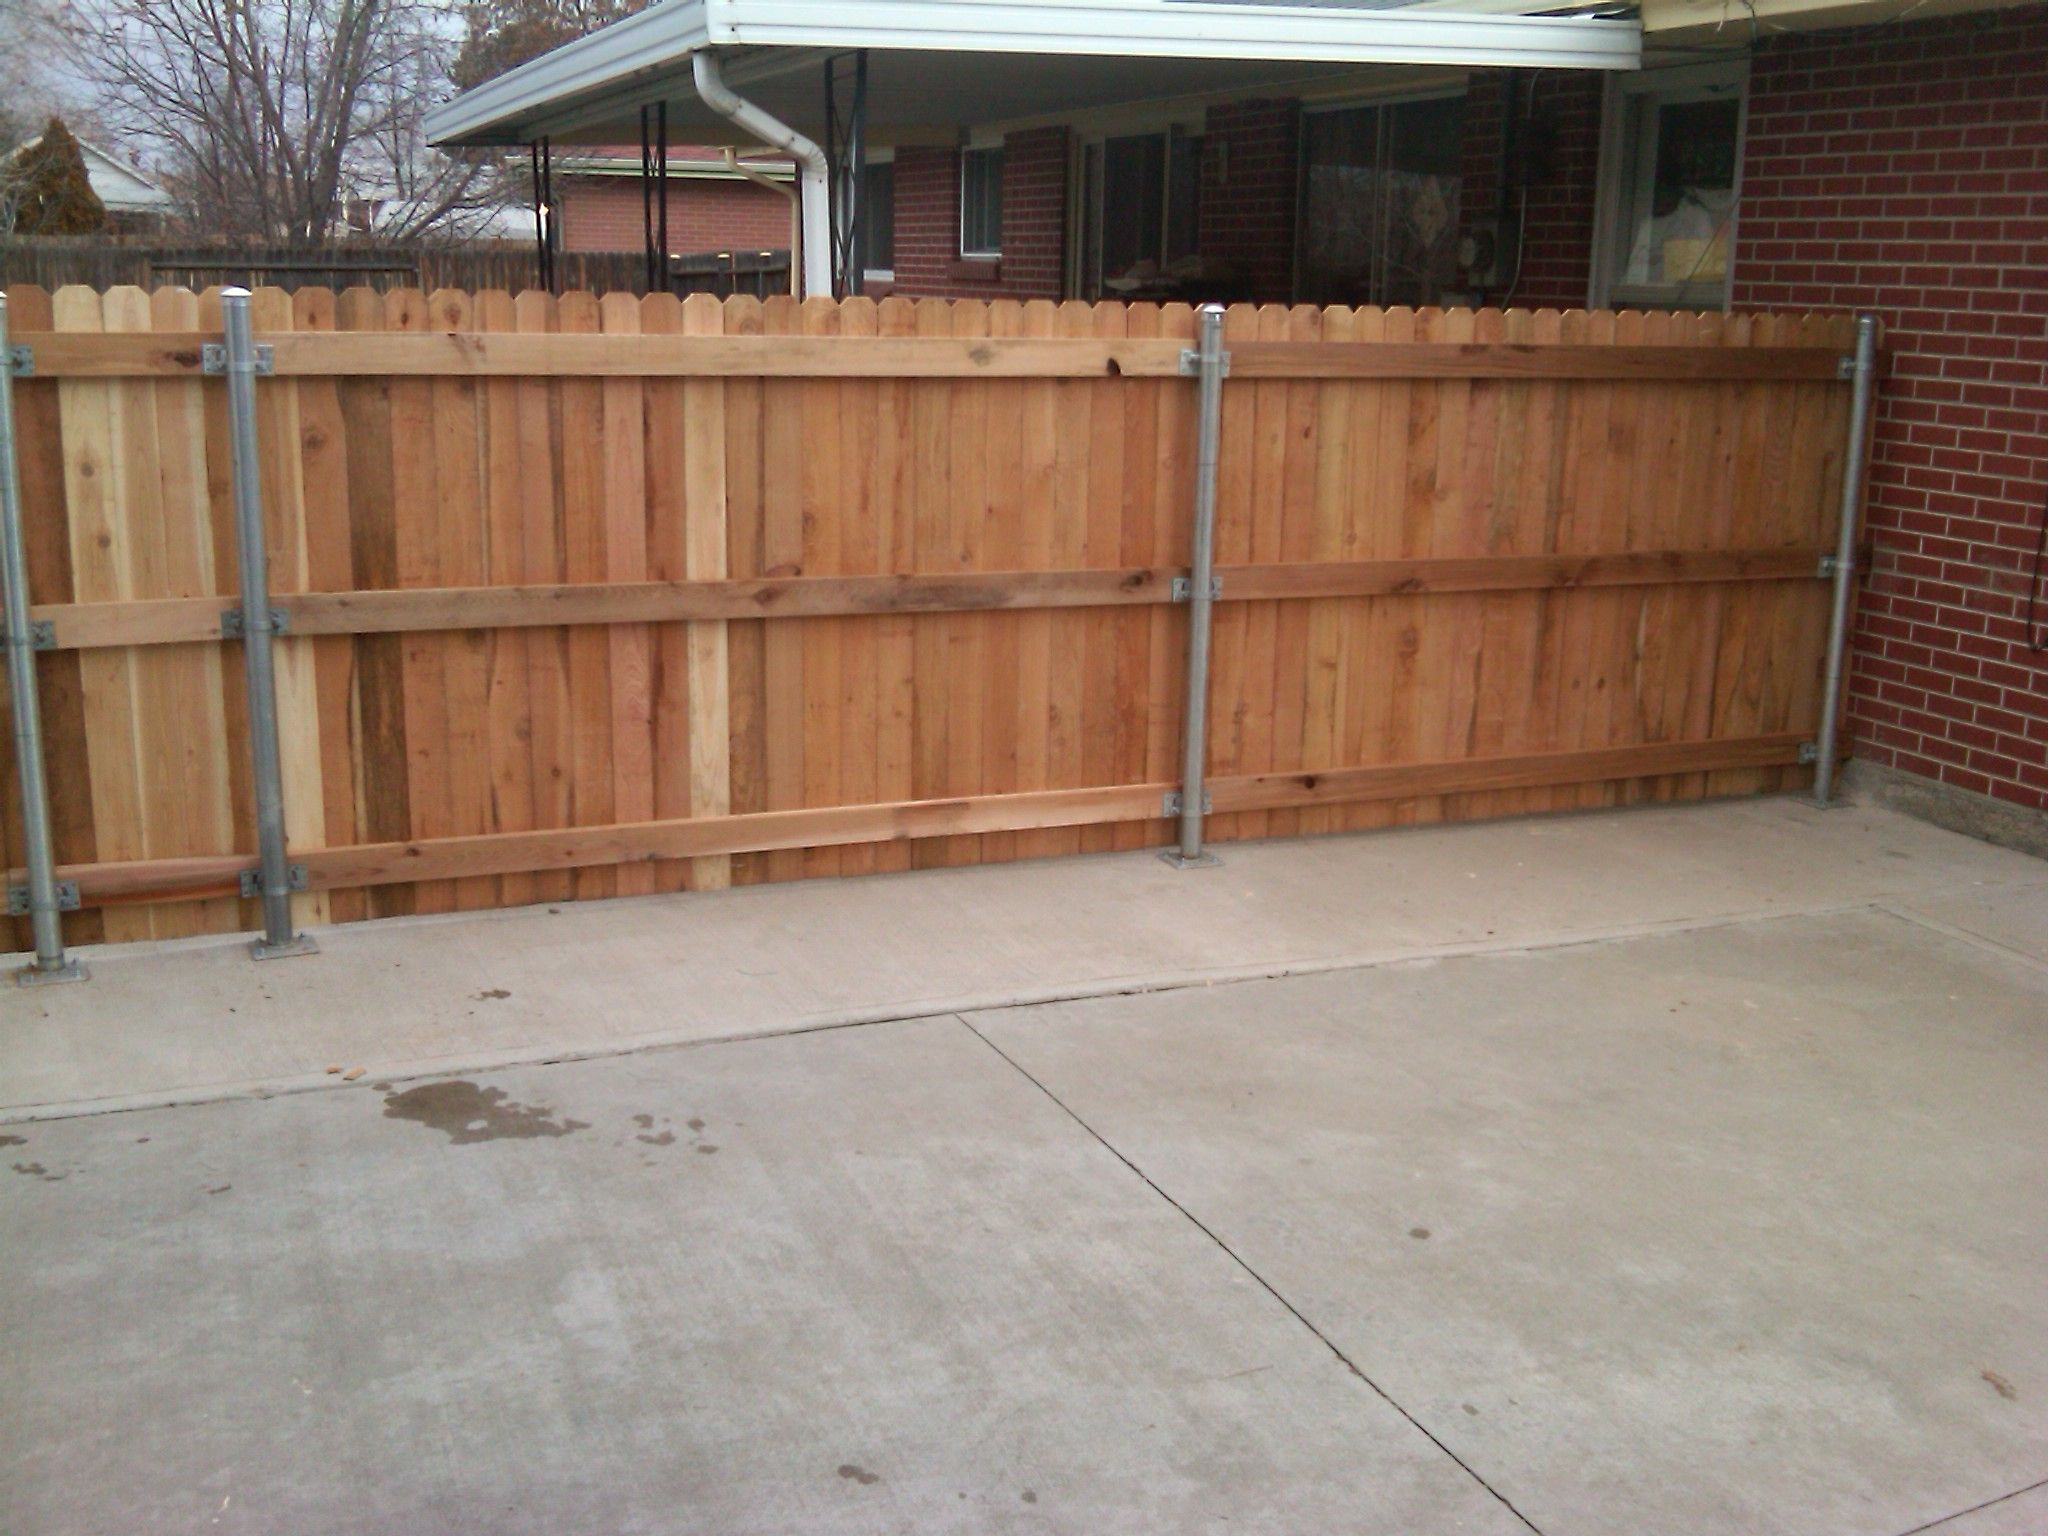 Pin By Mandy Mayock On Backyard Ideas Wood Fence Wooden Fence